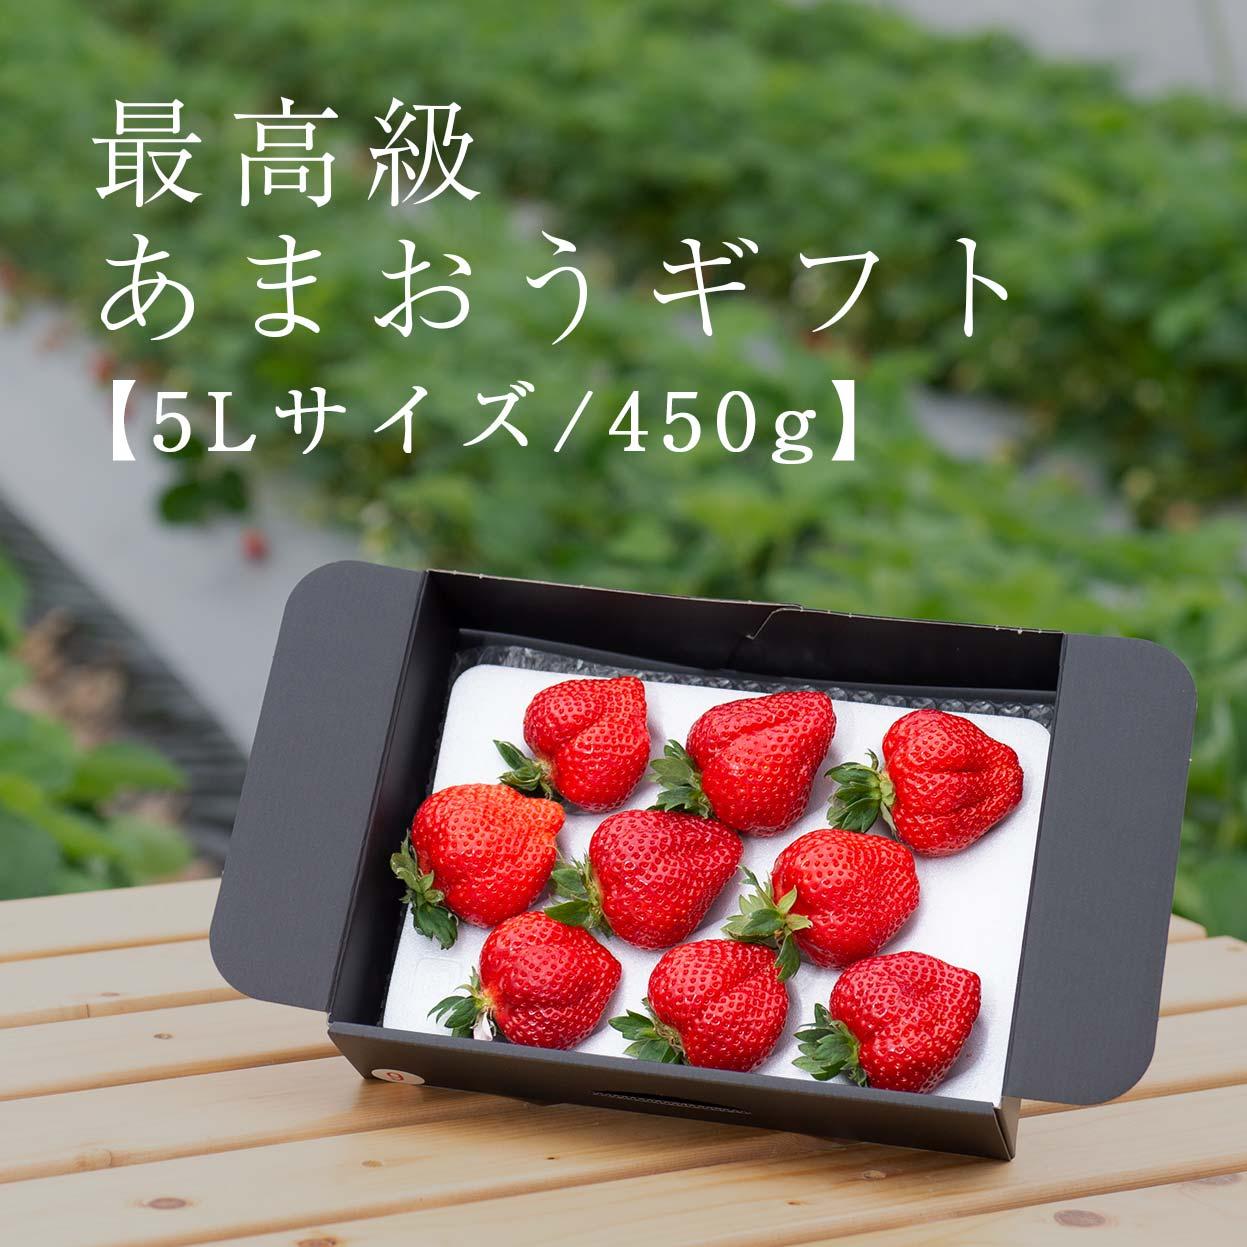 生果5L/450g